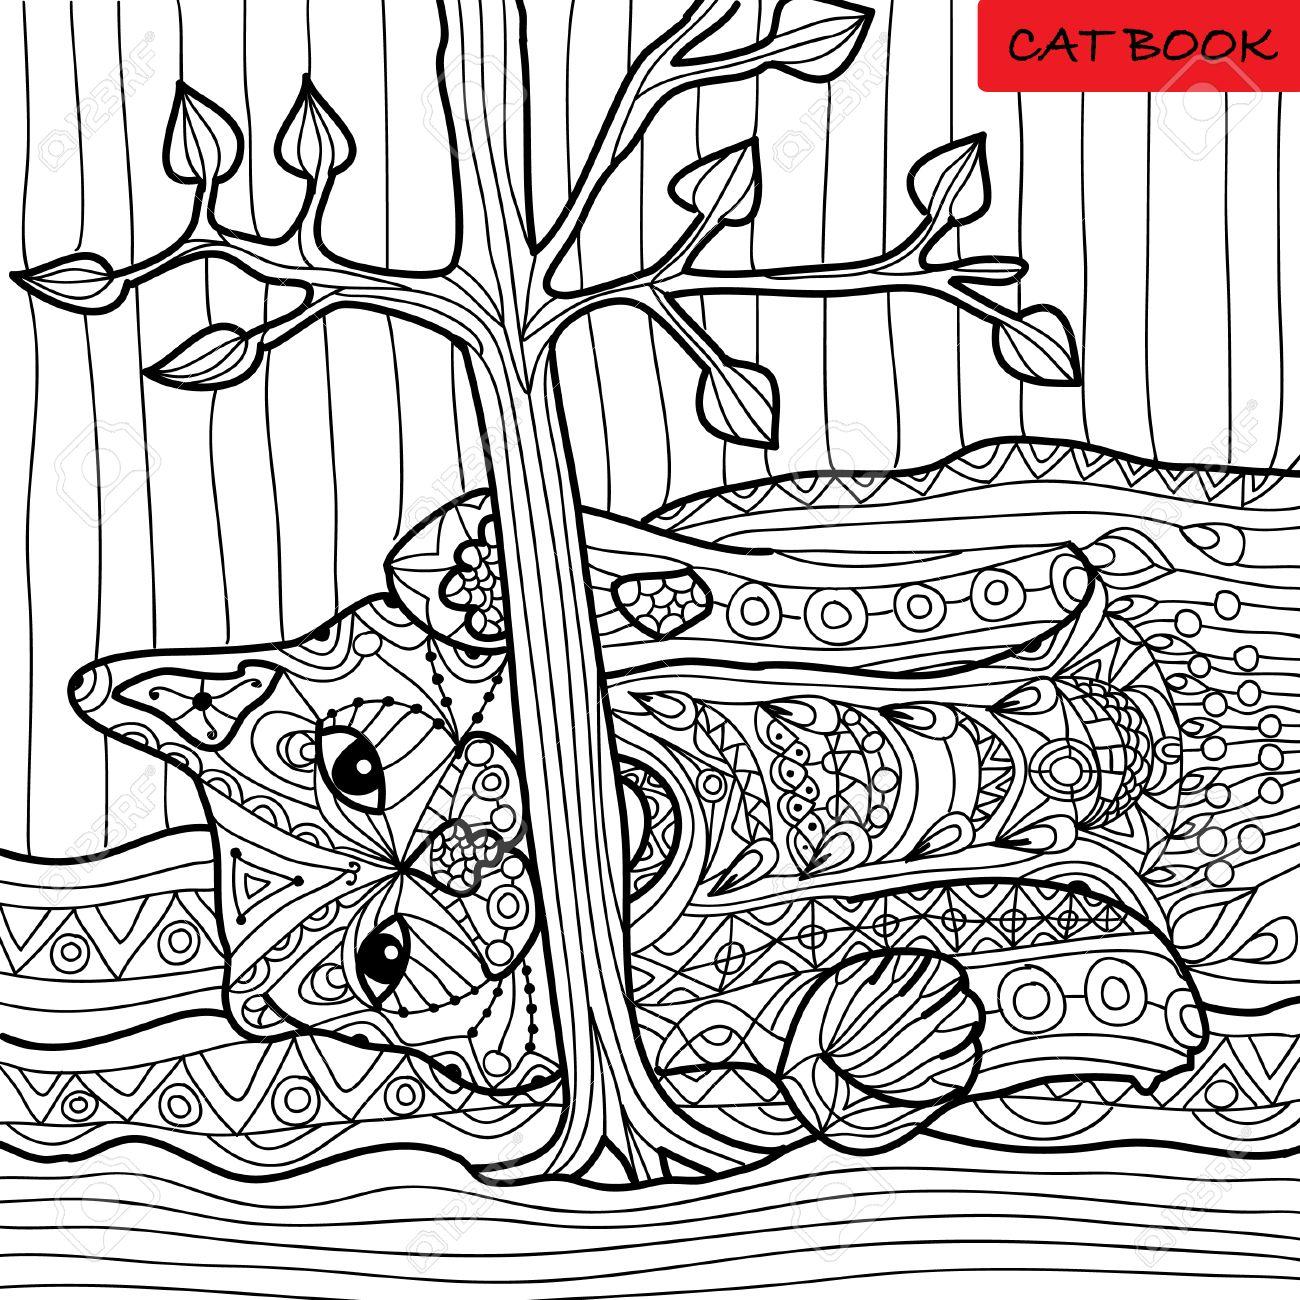 frech katze malbuch fr erwachsene zentangle muster hand gezeichnete illustration standard bild - Zentangle Muster